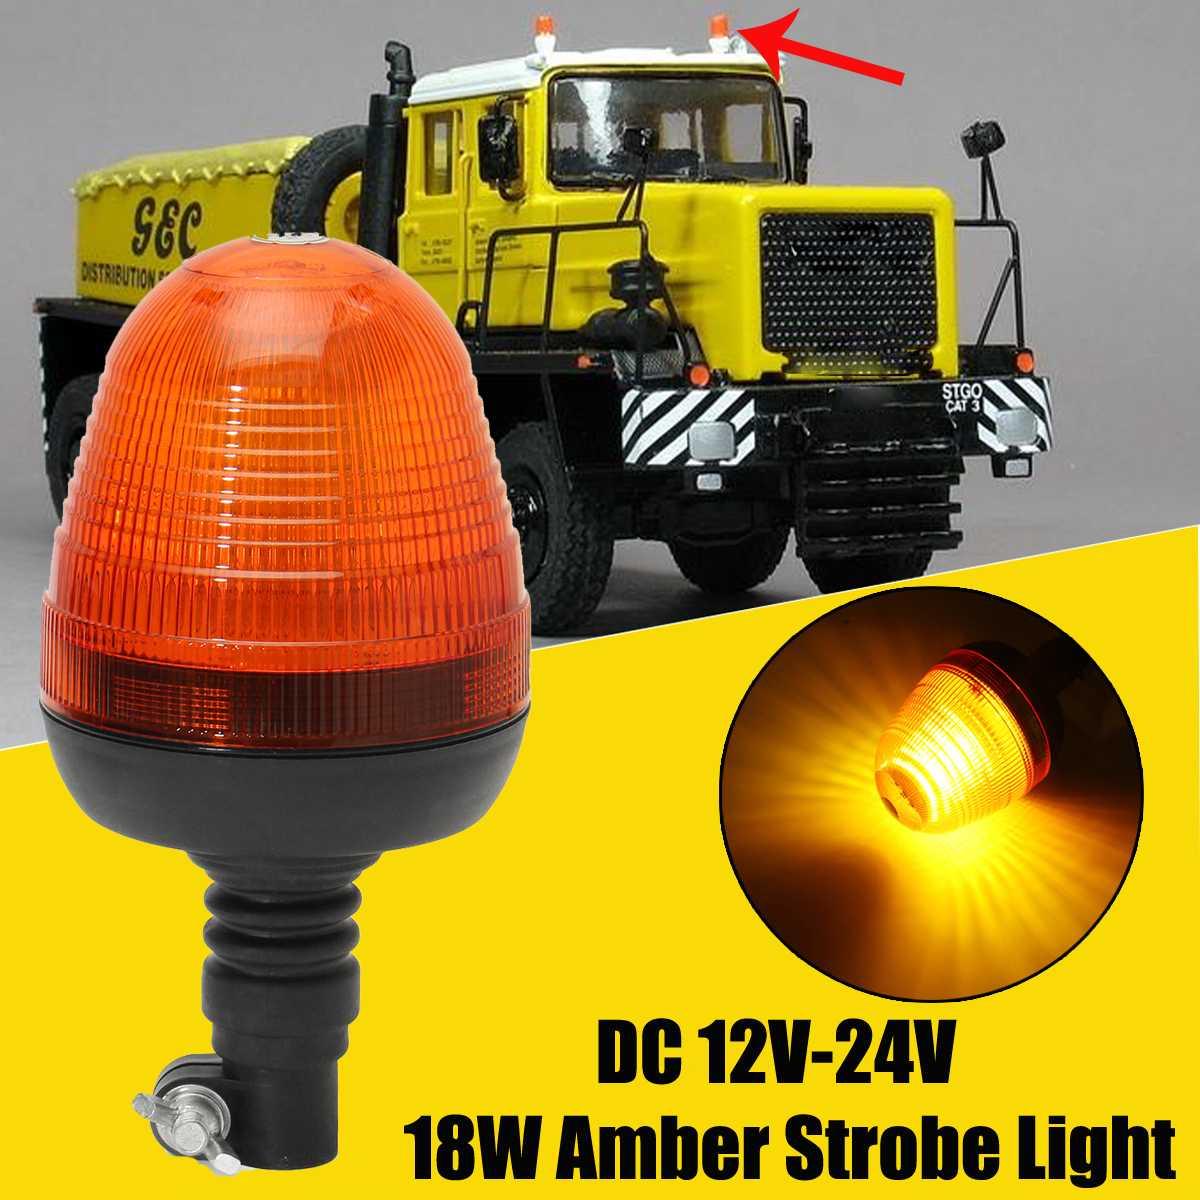 Safurance DC 12V-24V 18W Outdoor LED Strobe Flashing Alarm Lamp Amber Forklift Car Emergency Warning Strobe Rotating LED Light